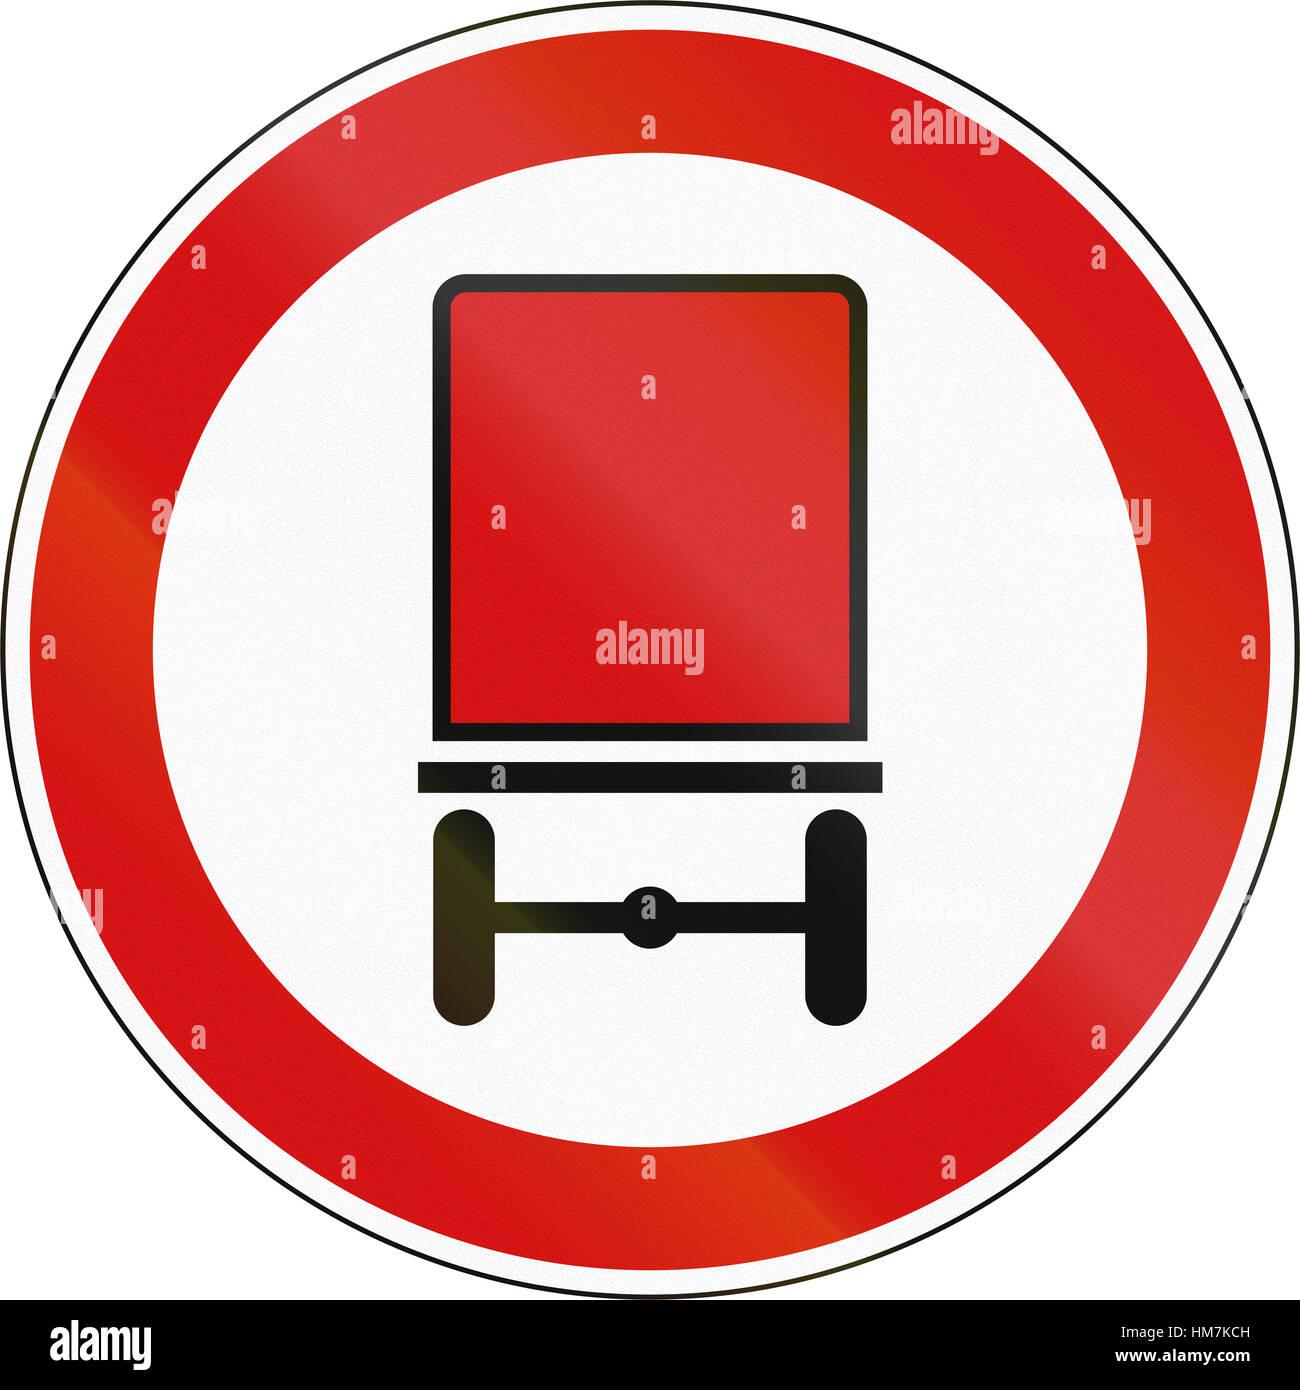 A Slovenian Prohibition Sign No Vehicles Carrying Dangerous Goods